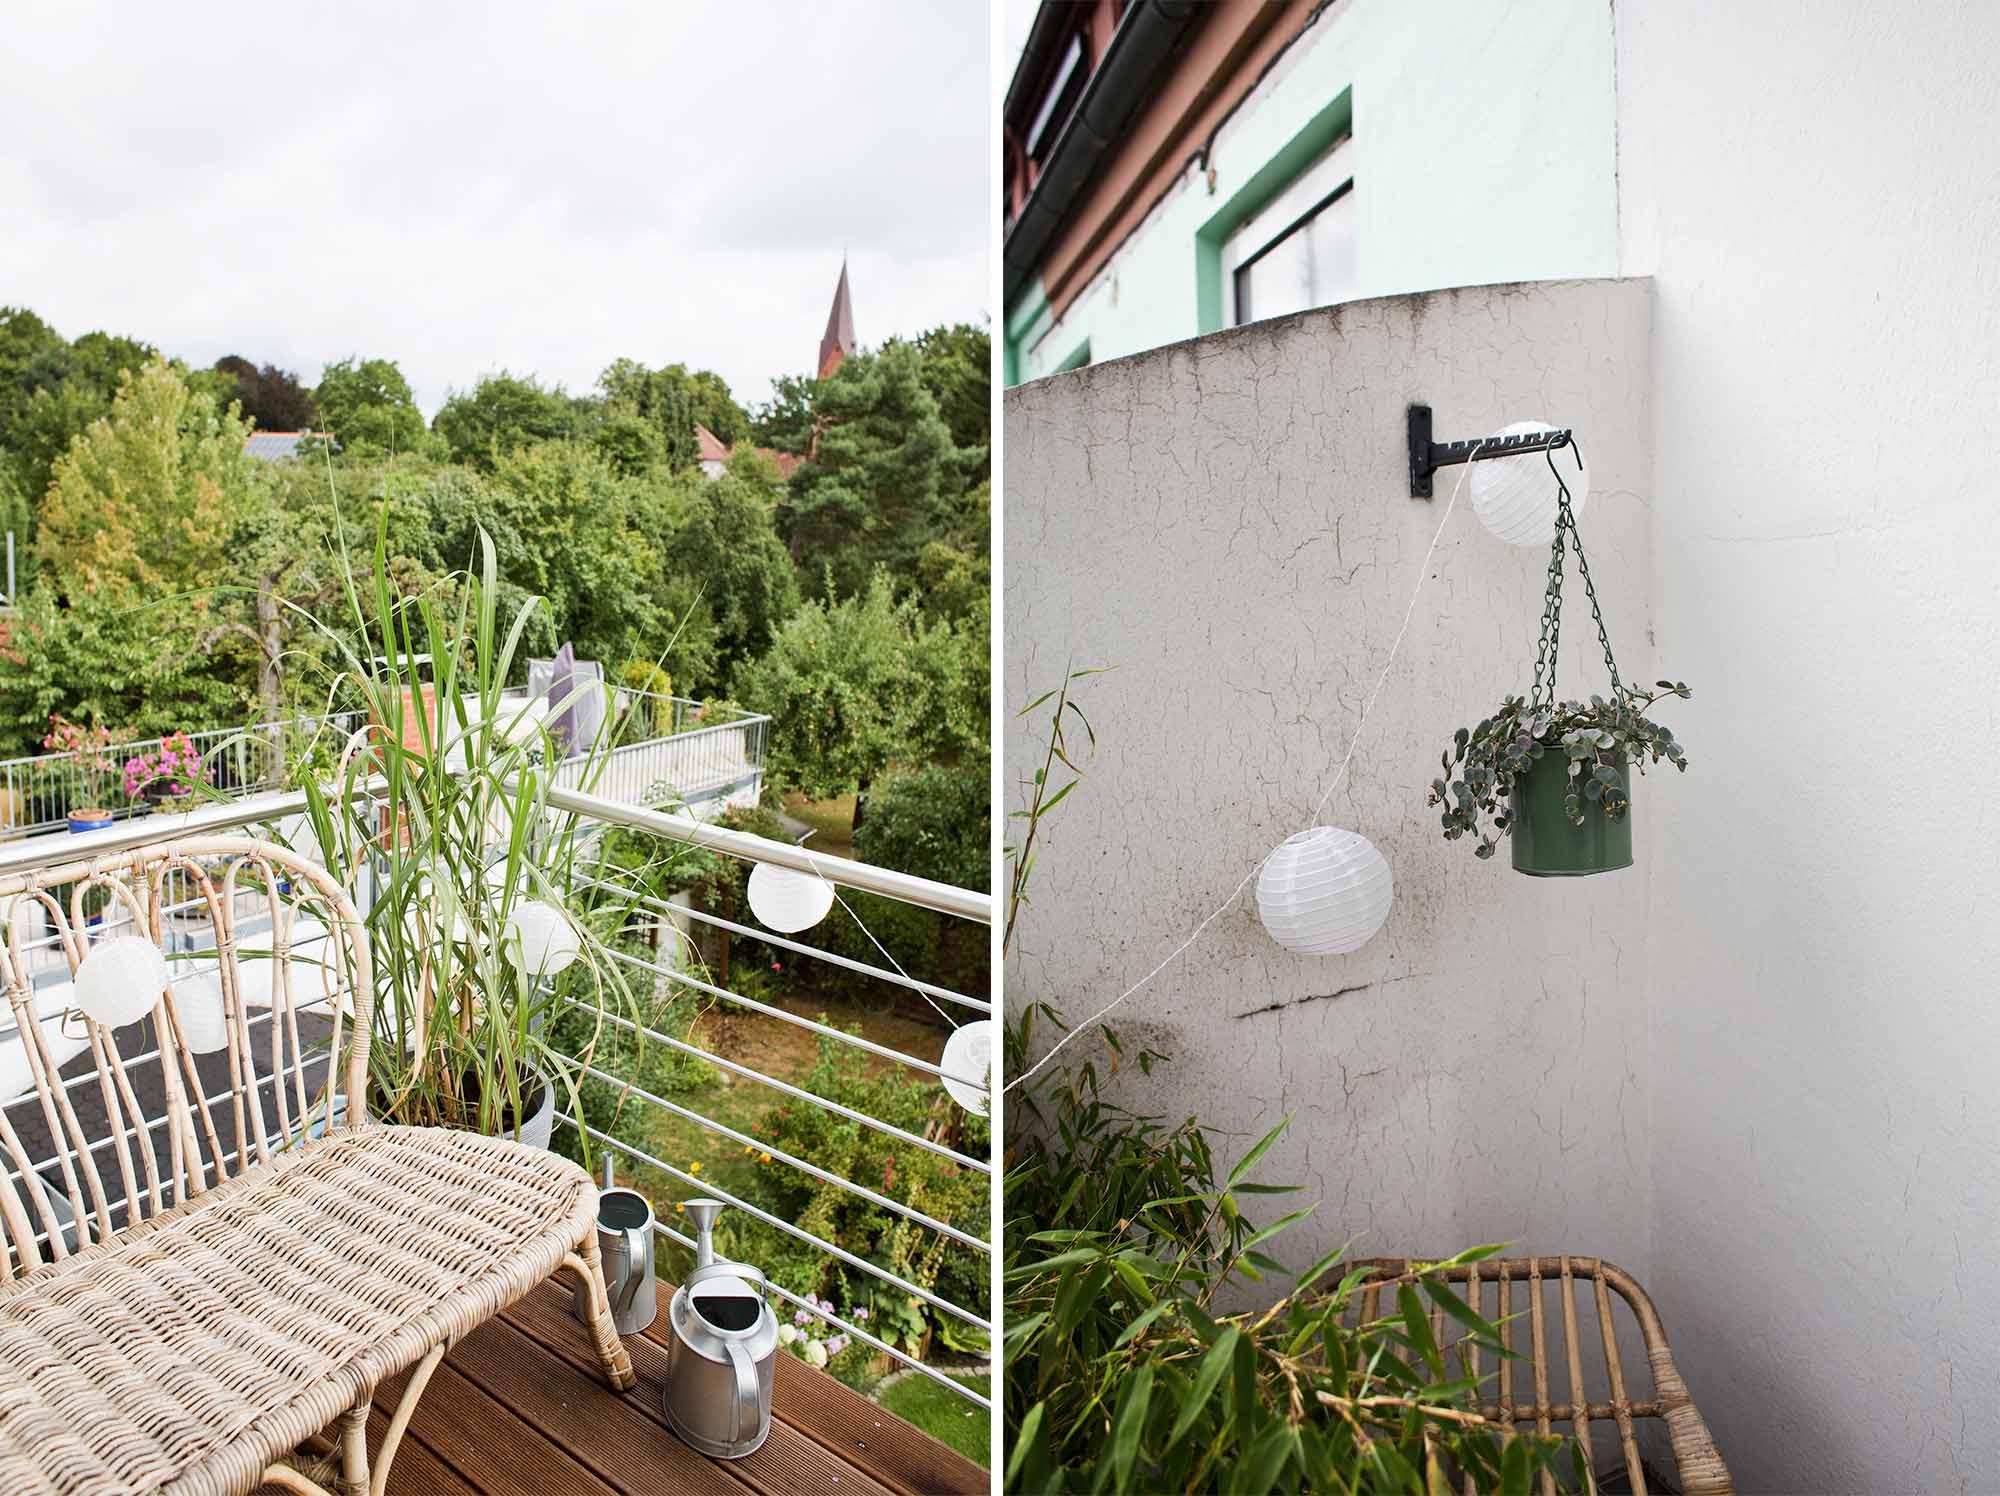 27-balkon_Altbremerhausmomente_4711_29